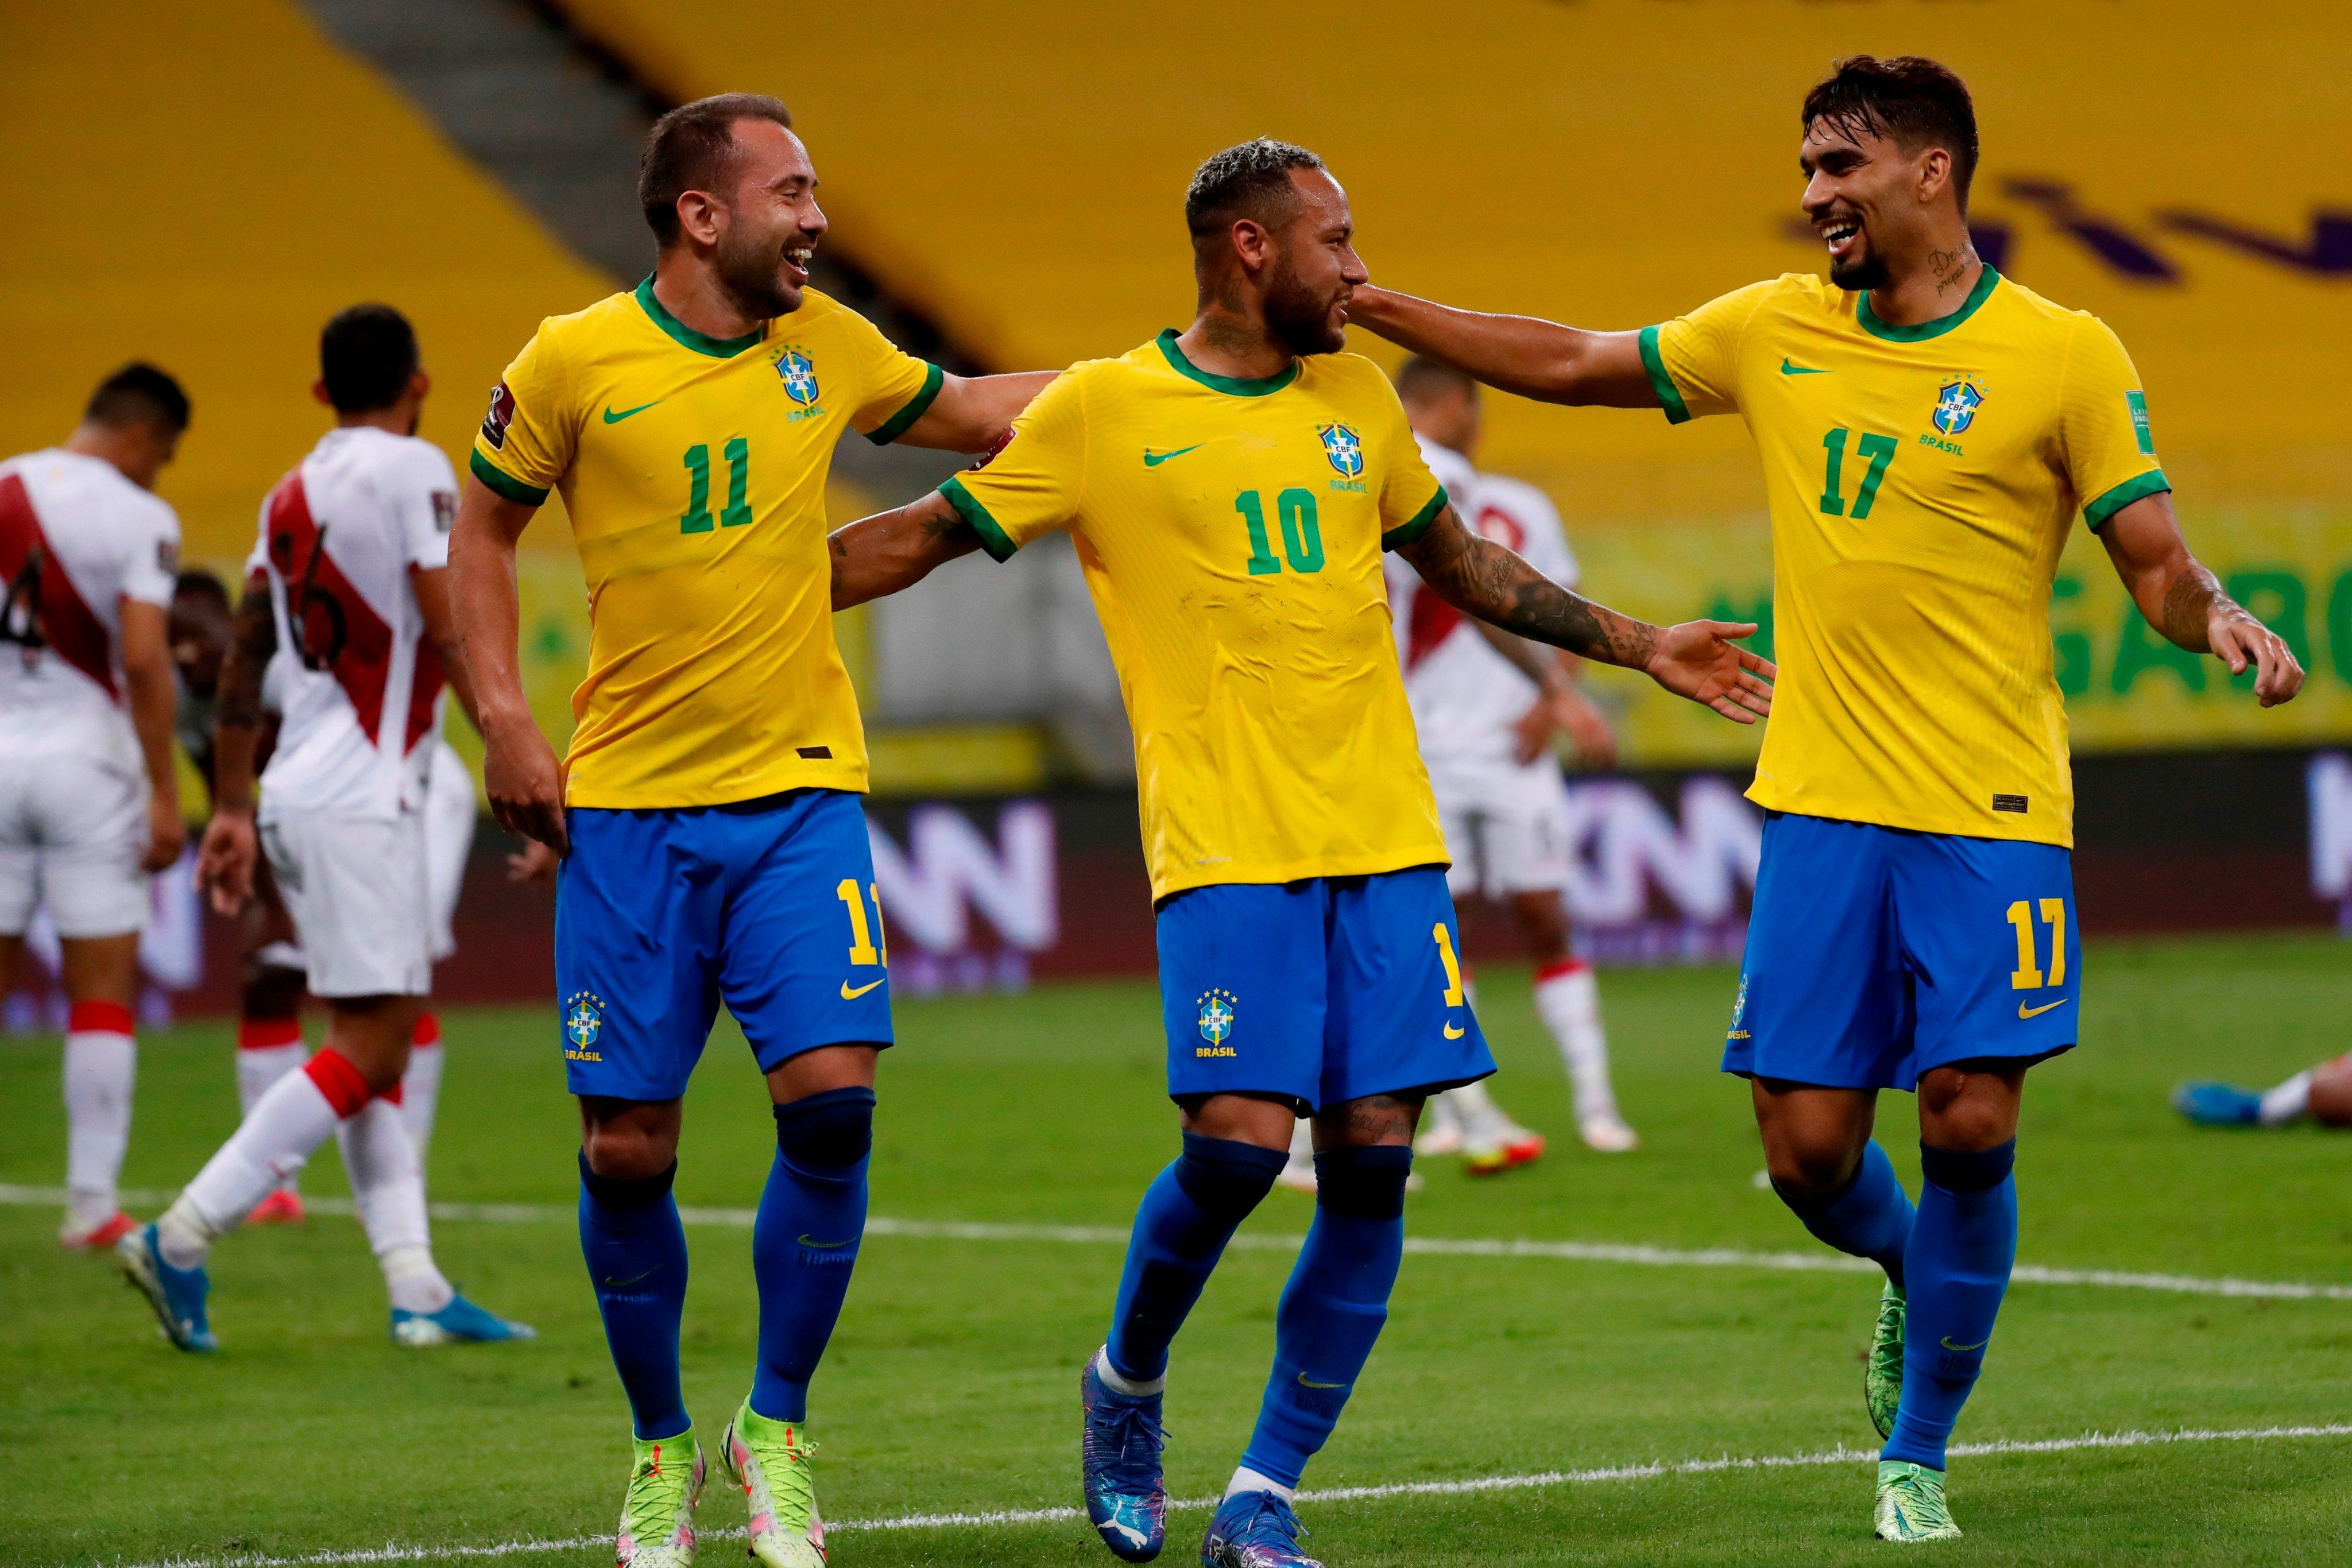 Brasil vs Perú 2-0 Jornada 9 Eliminatorias CONMEBOL 2022